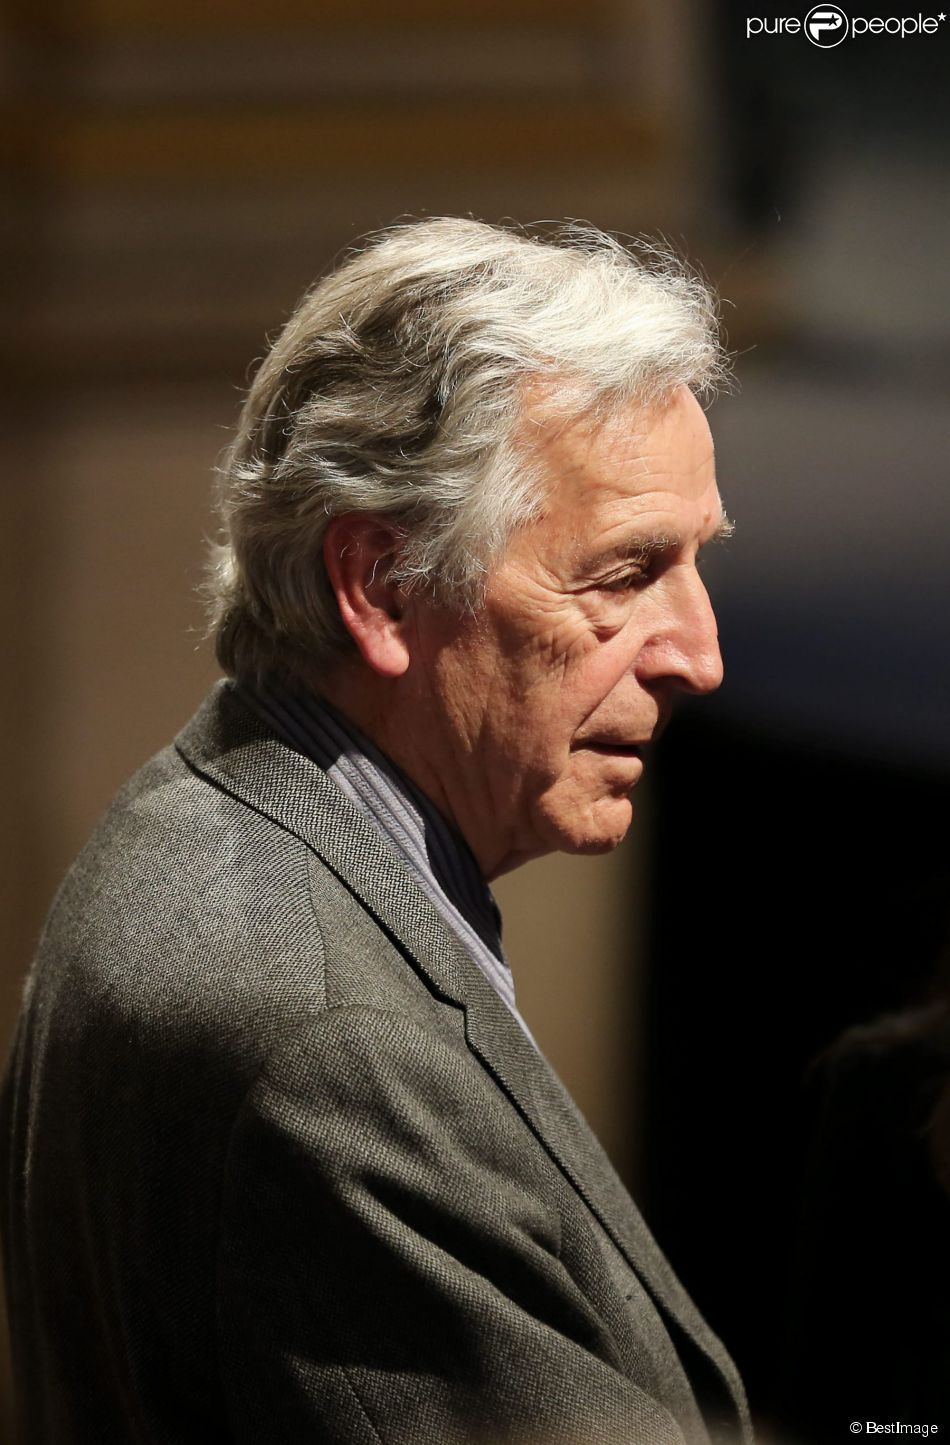 Constantin Costa-Gavras à Paris le 16 avril 2014.